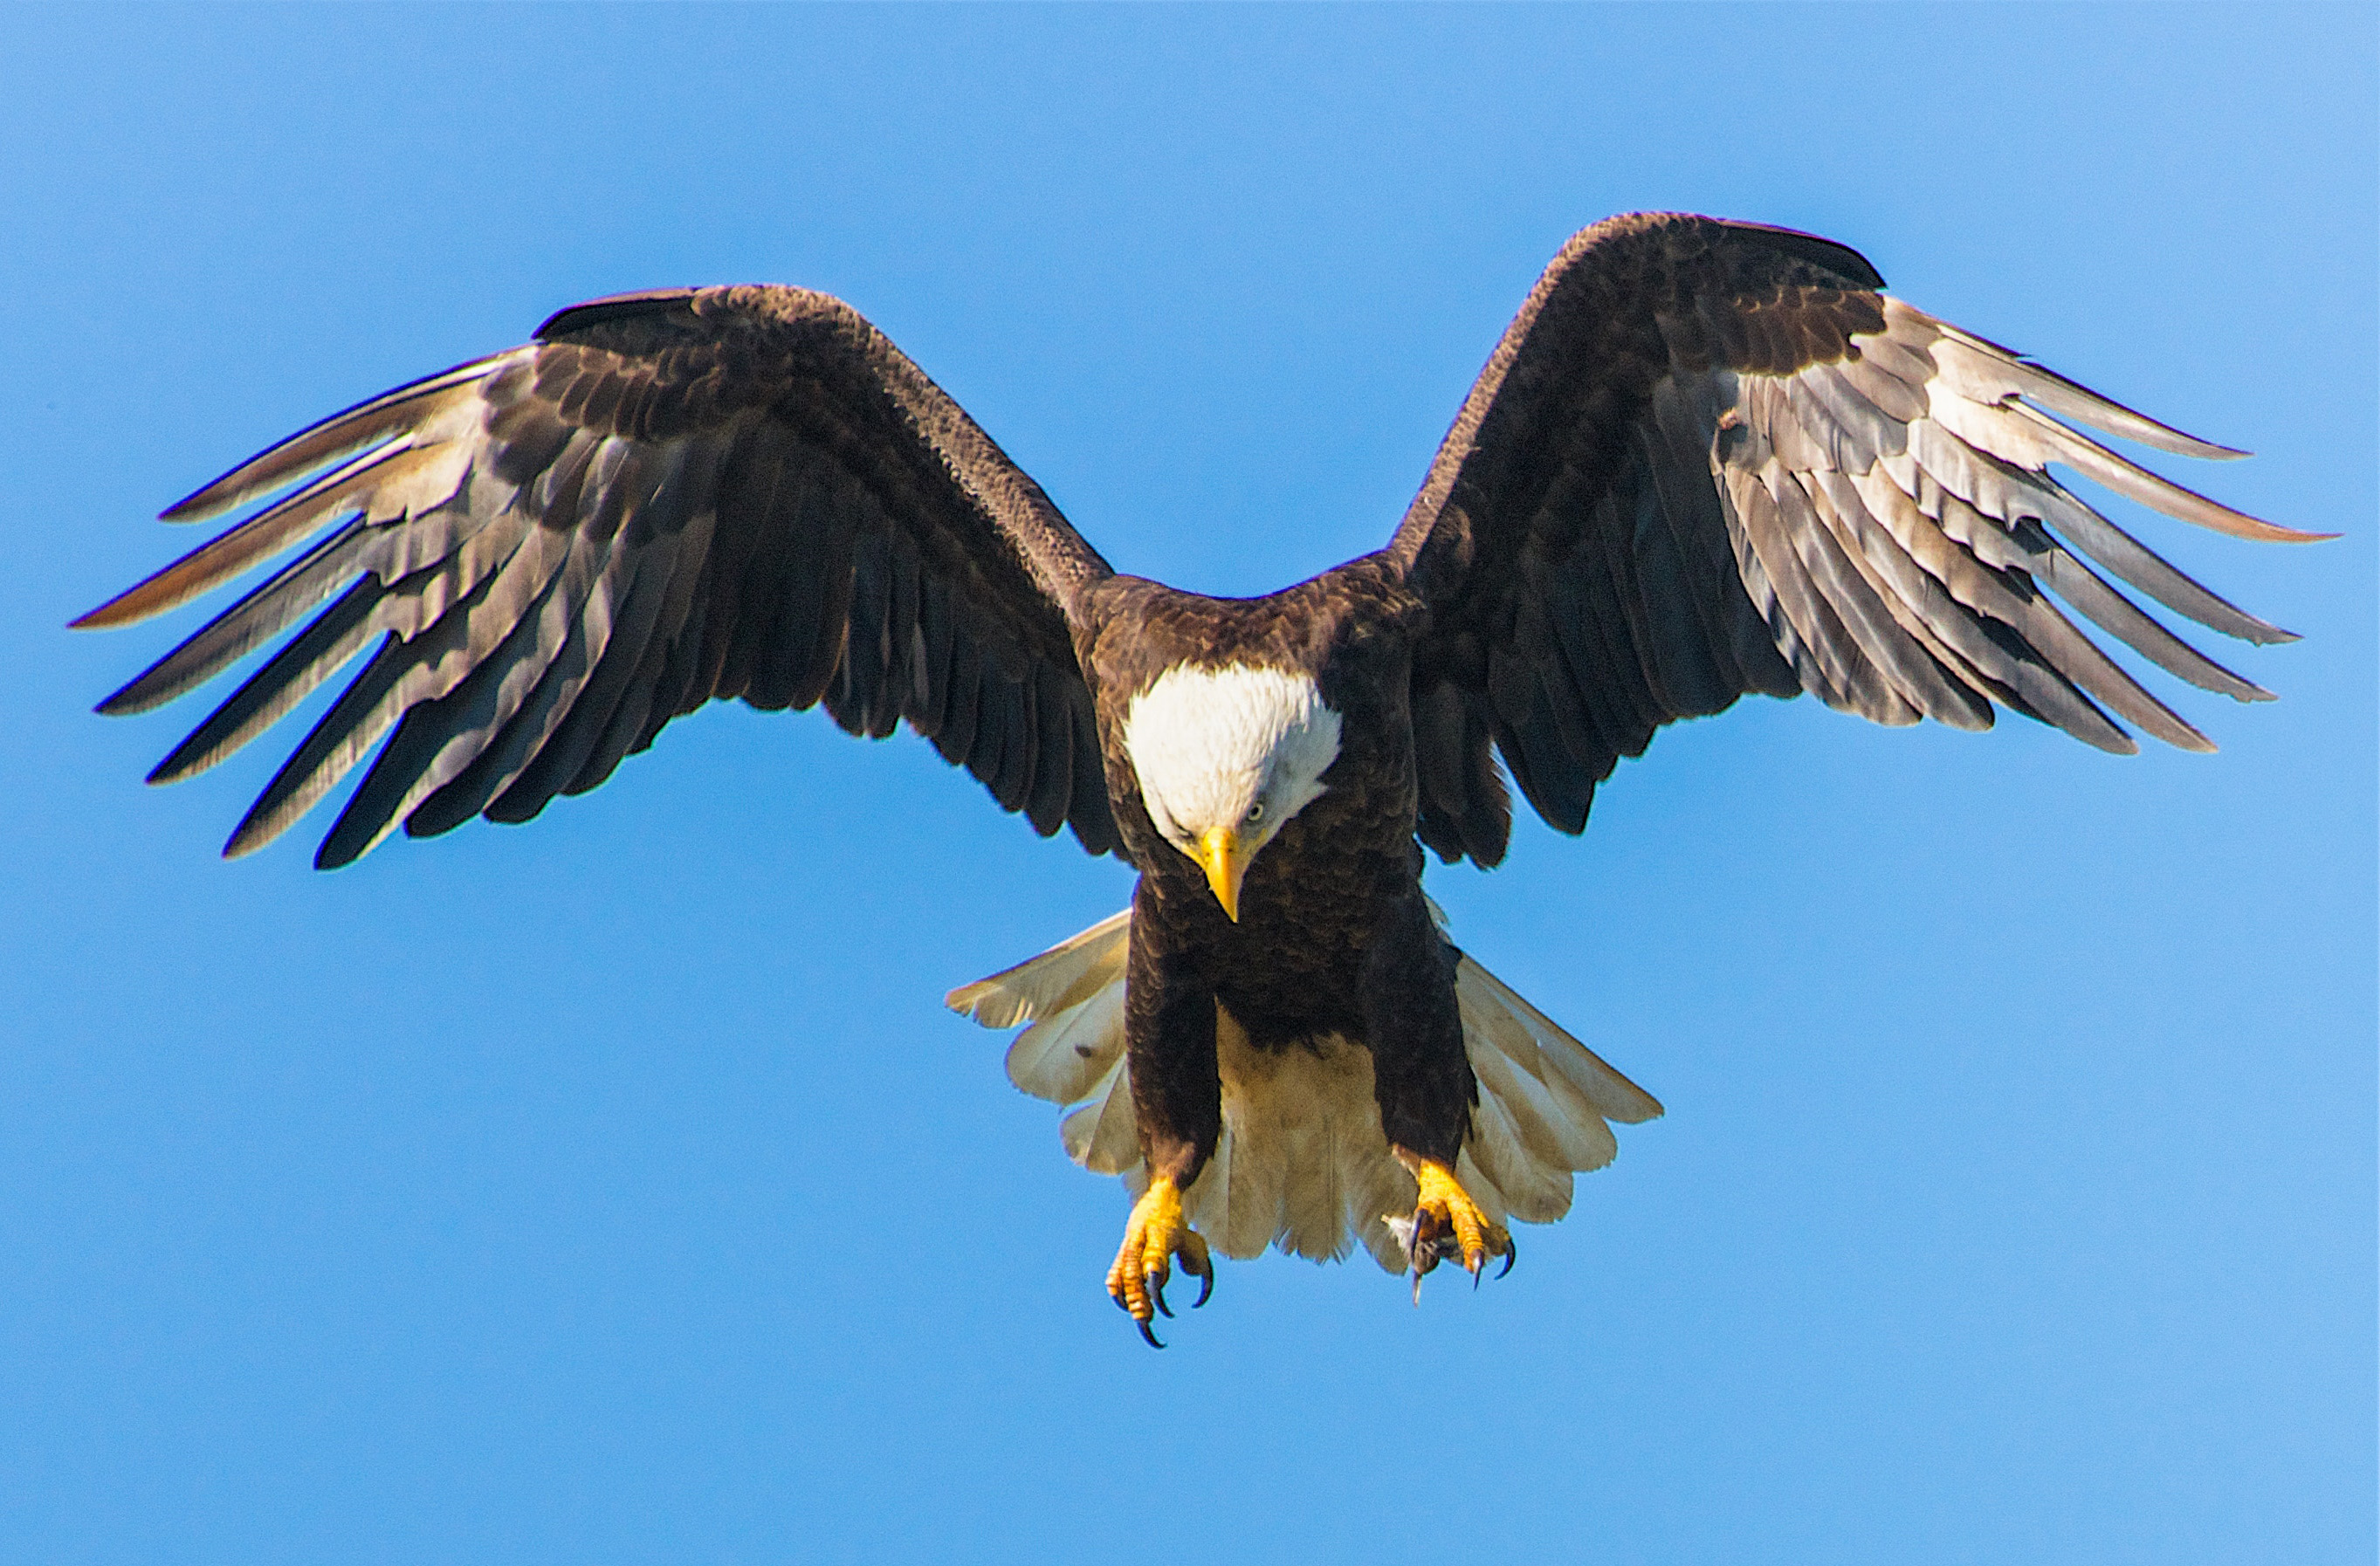 kiddie eagle